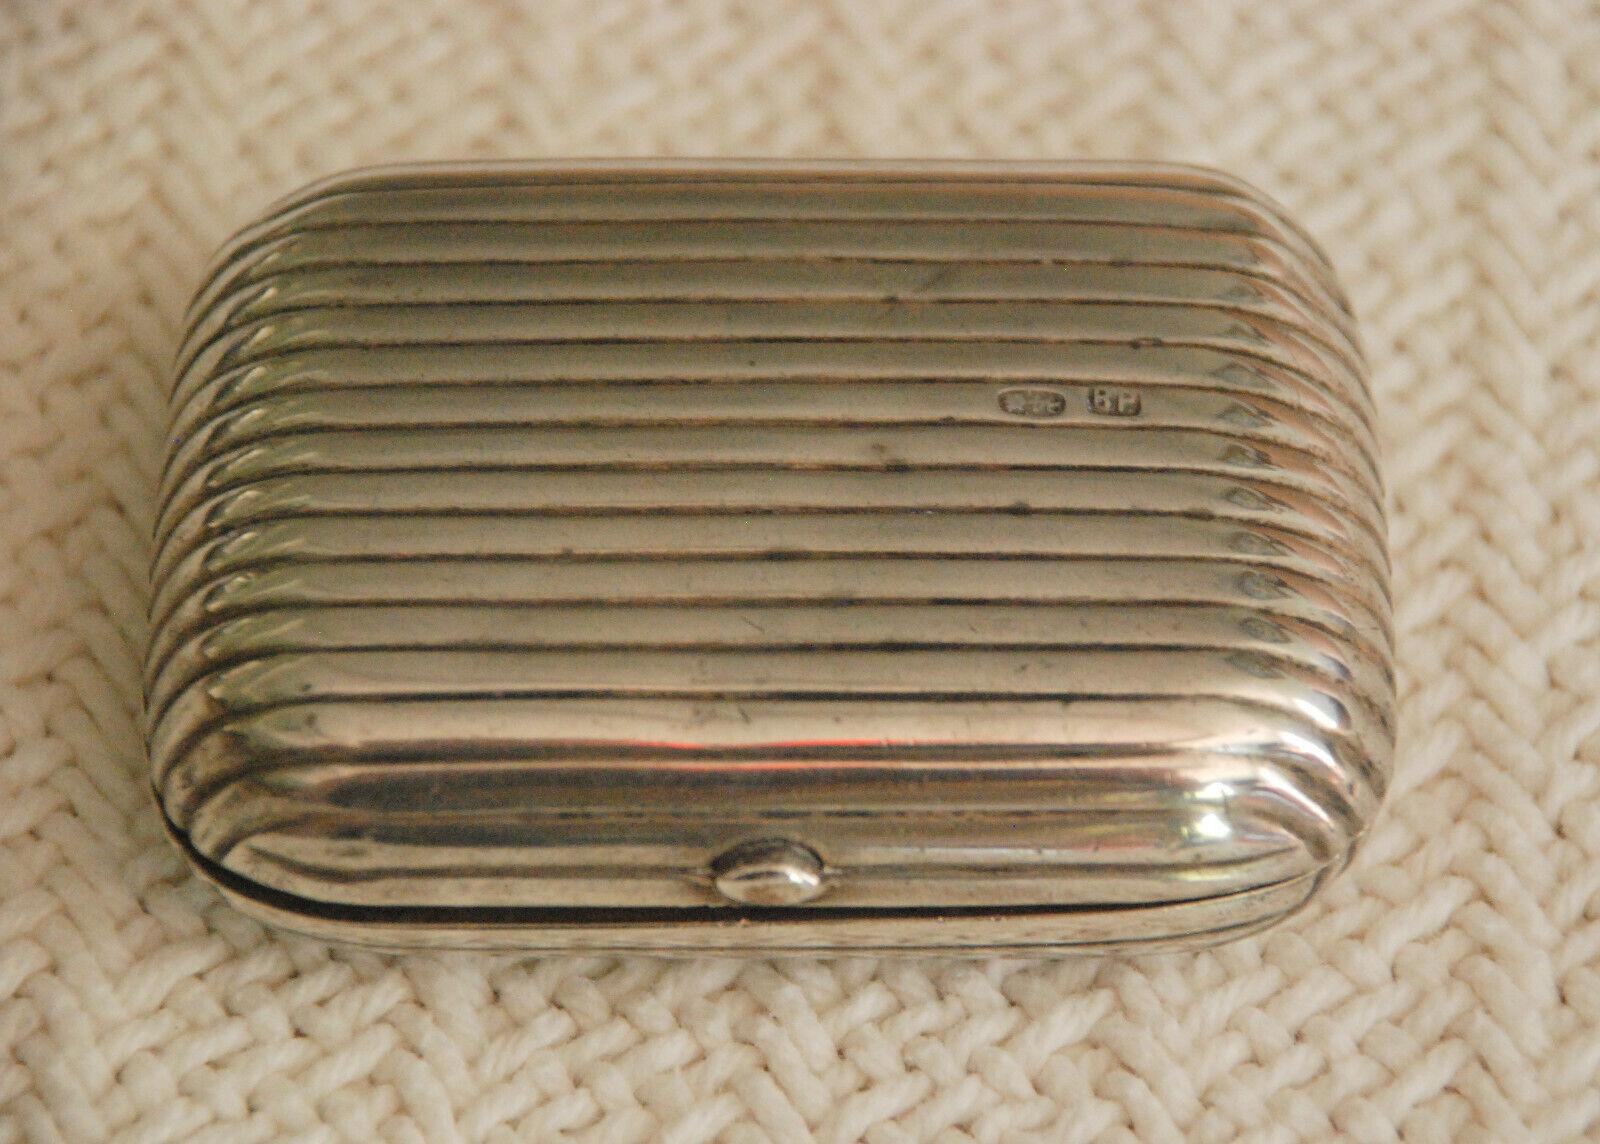 Antique Tsarist Russian Snuff Box Case Imperial Russia Hallmarked 84 BP 1800 s - $174.99